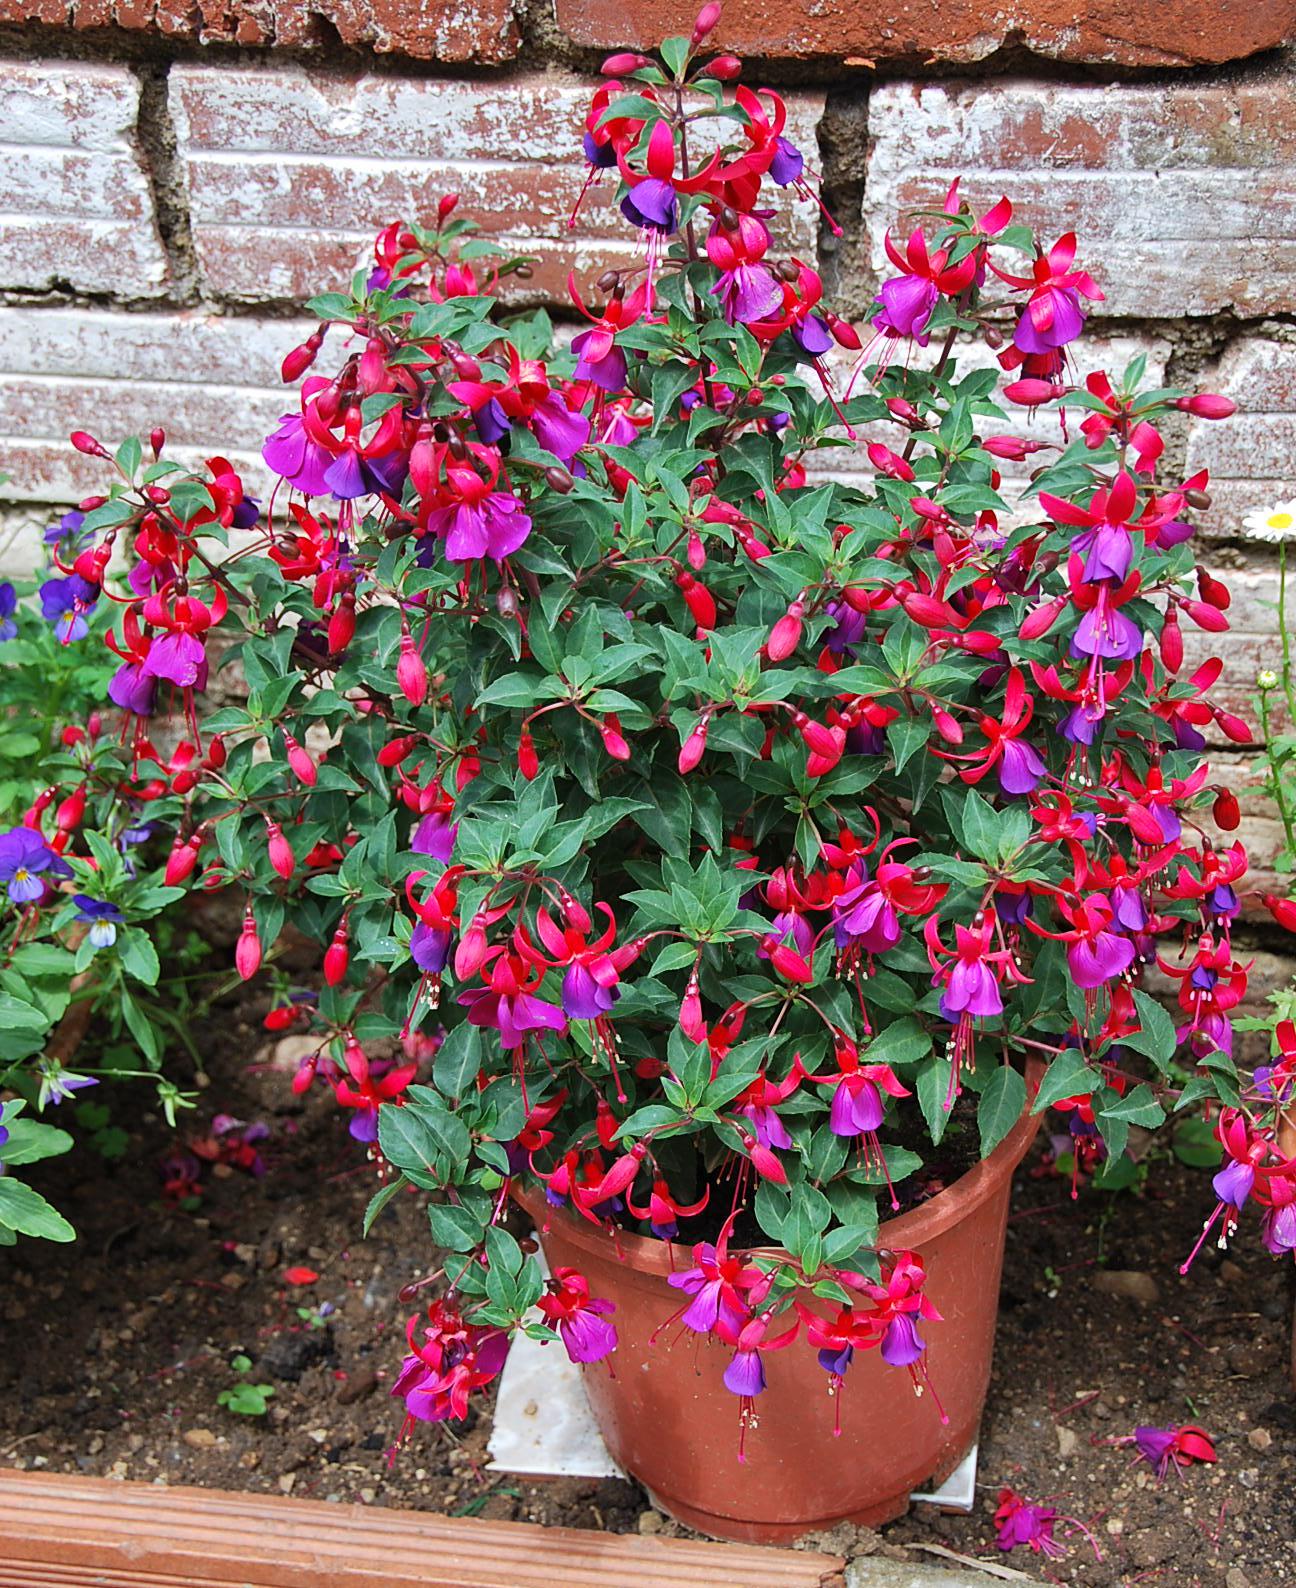 Plantas de exterior resistentes al calor grosir baju - Plantas de exterior resistentes al sol ...